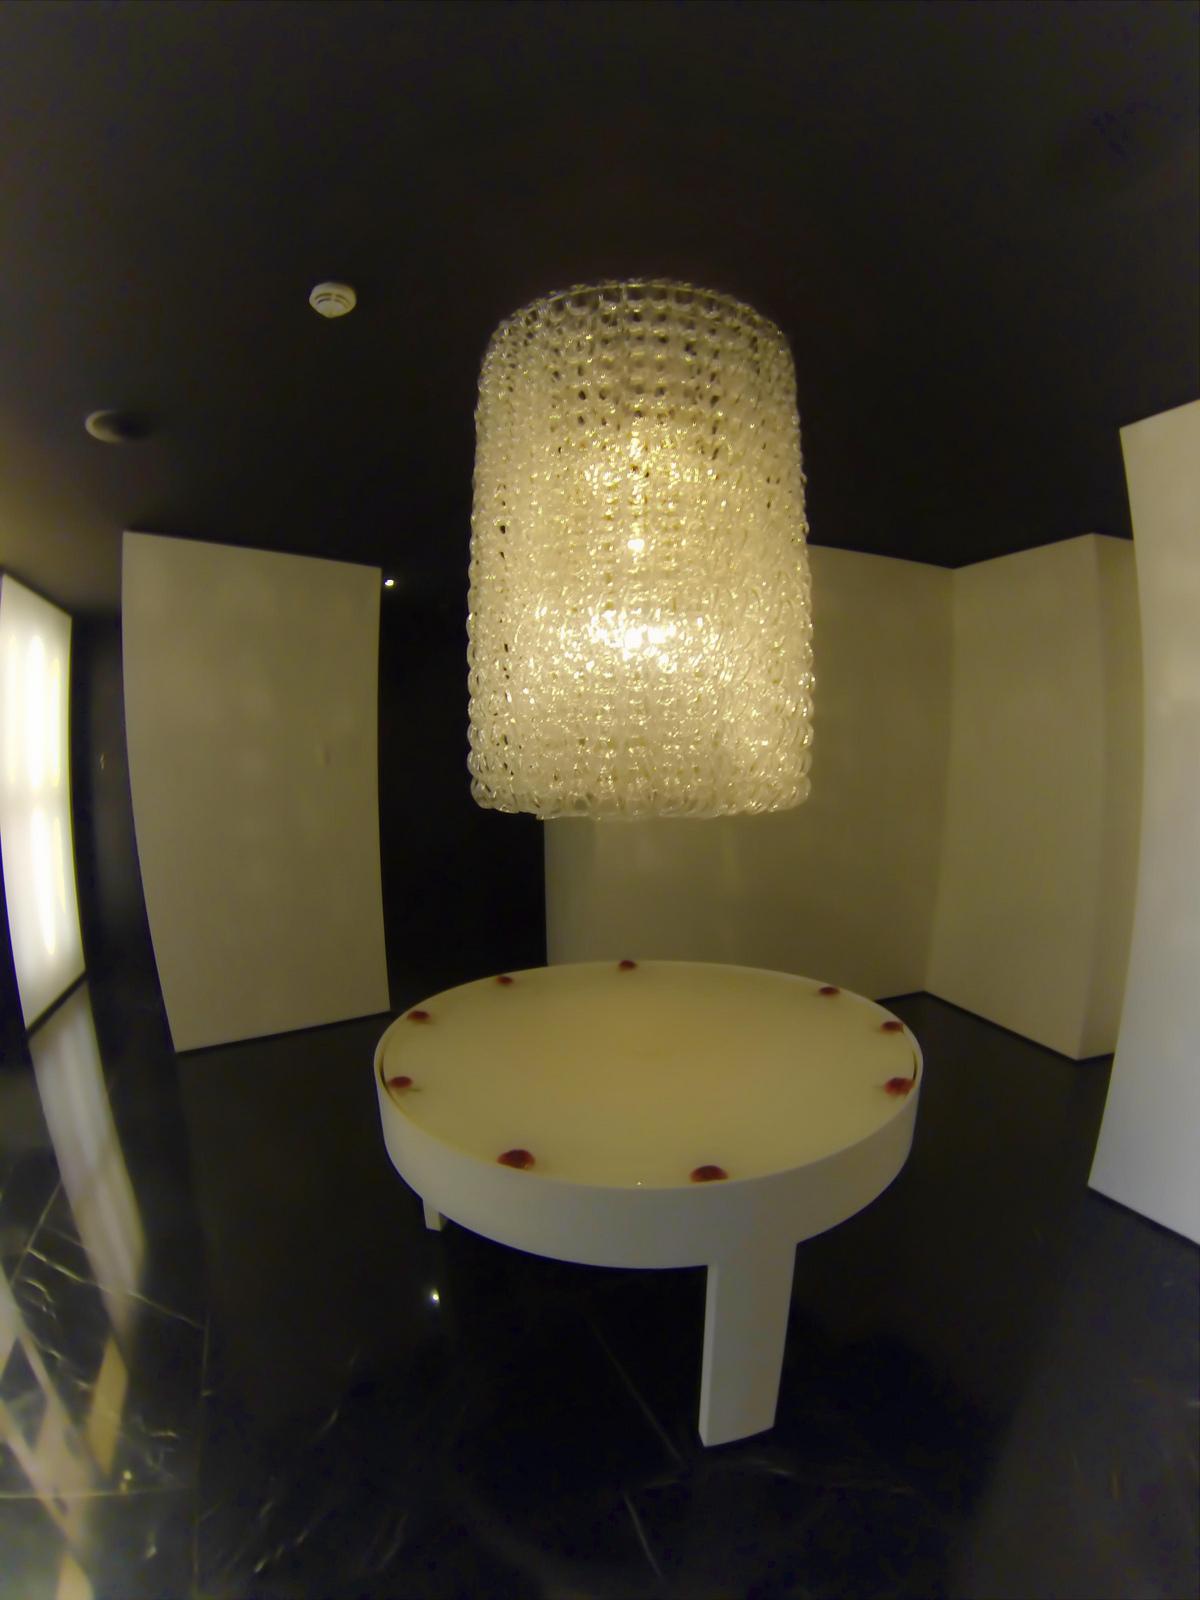 conservatorium-hotel-amsterdam-chandelier-table-fountain-outside-public-restrooms.jpg